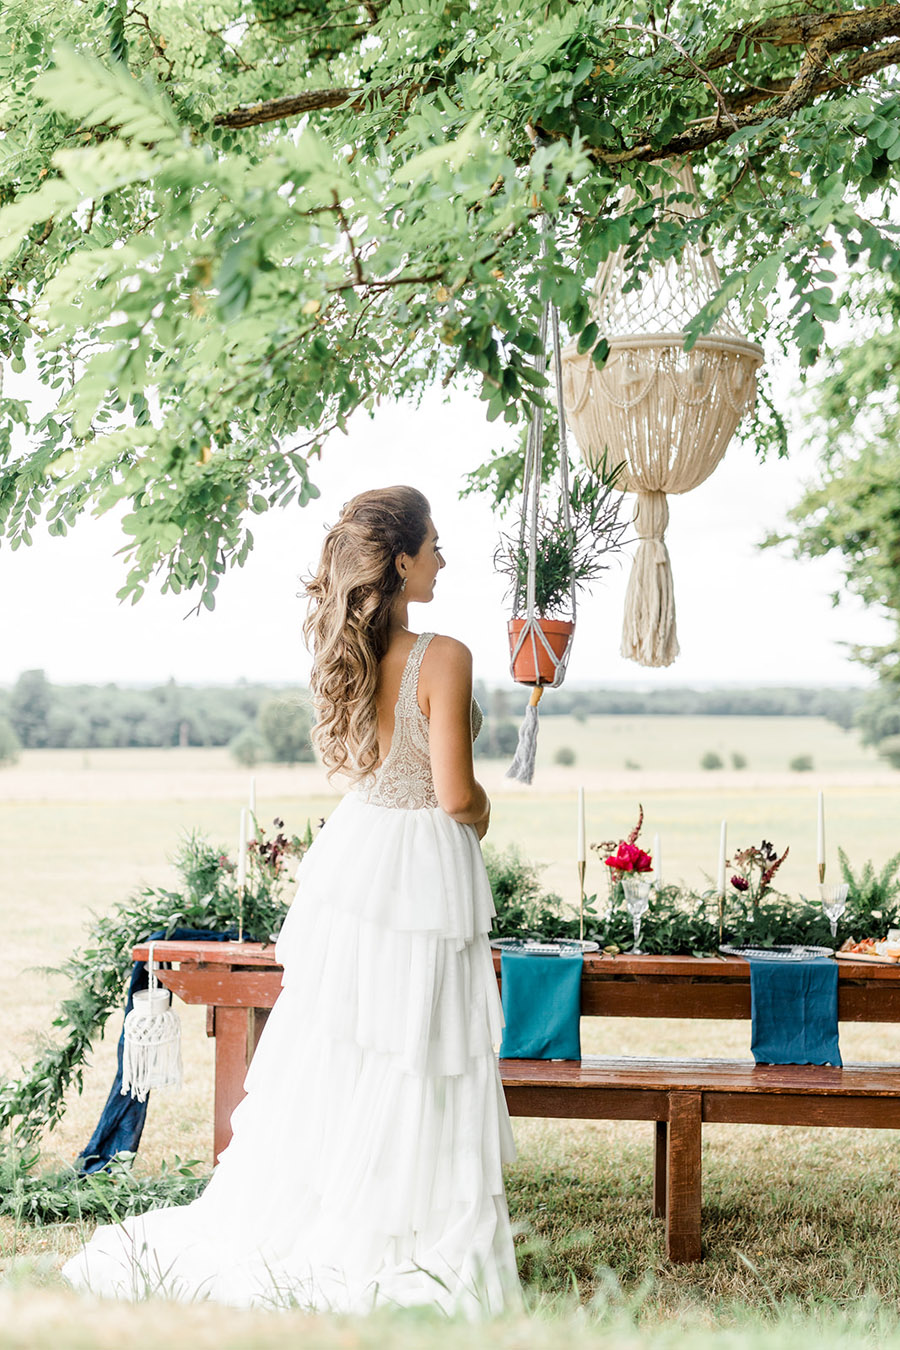 Modern Boho wedding style inspiration from Slindon House, photographer credit Kelsie Scully Photography (13)